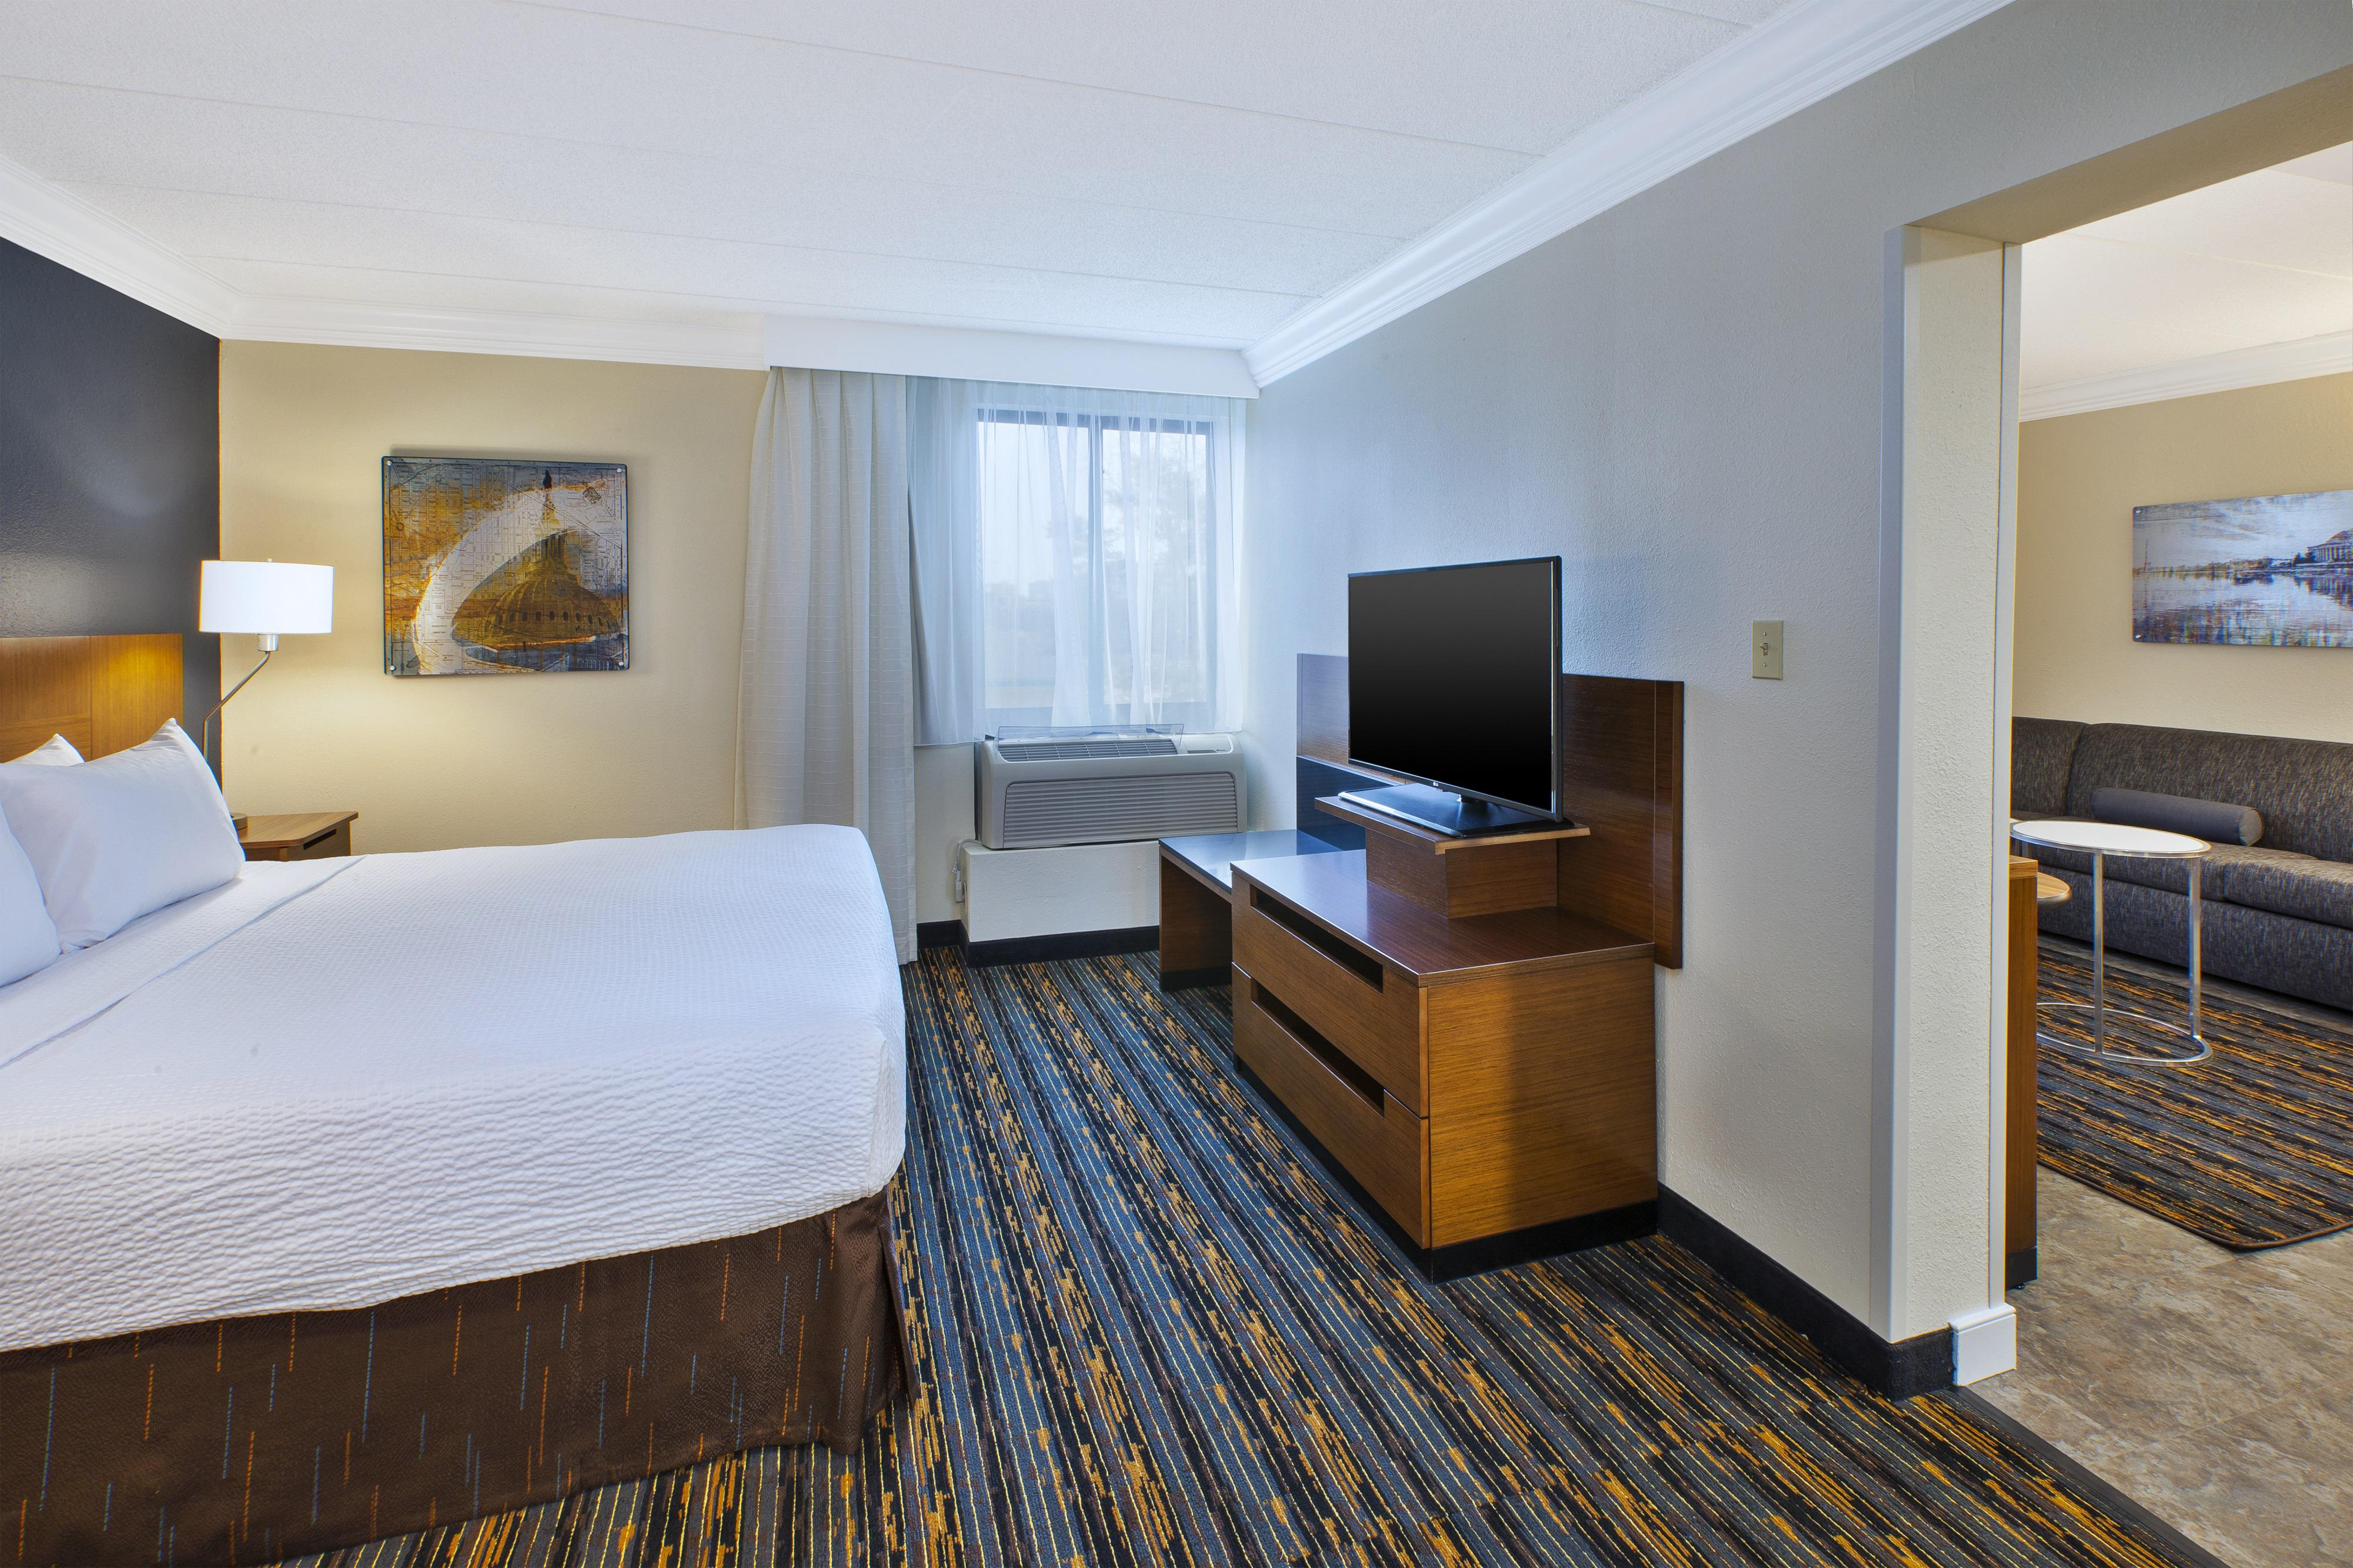 Fairfield Inn & Suites by Marriott Dulles Airport Herndon/Reston image 10